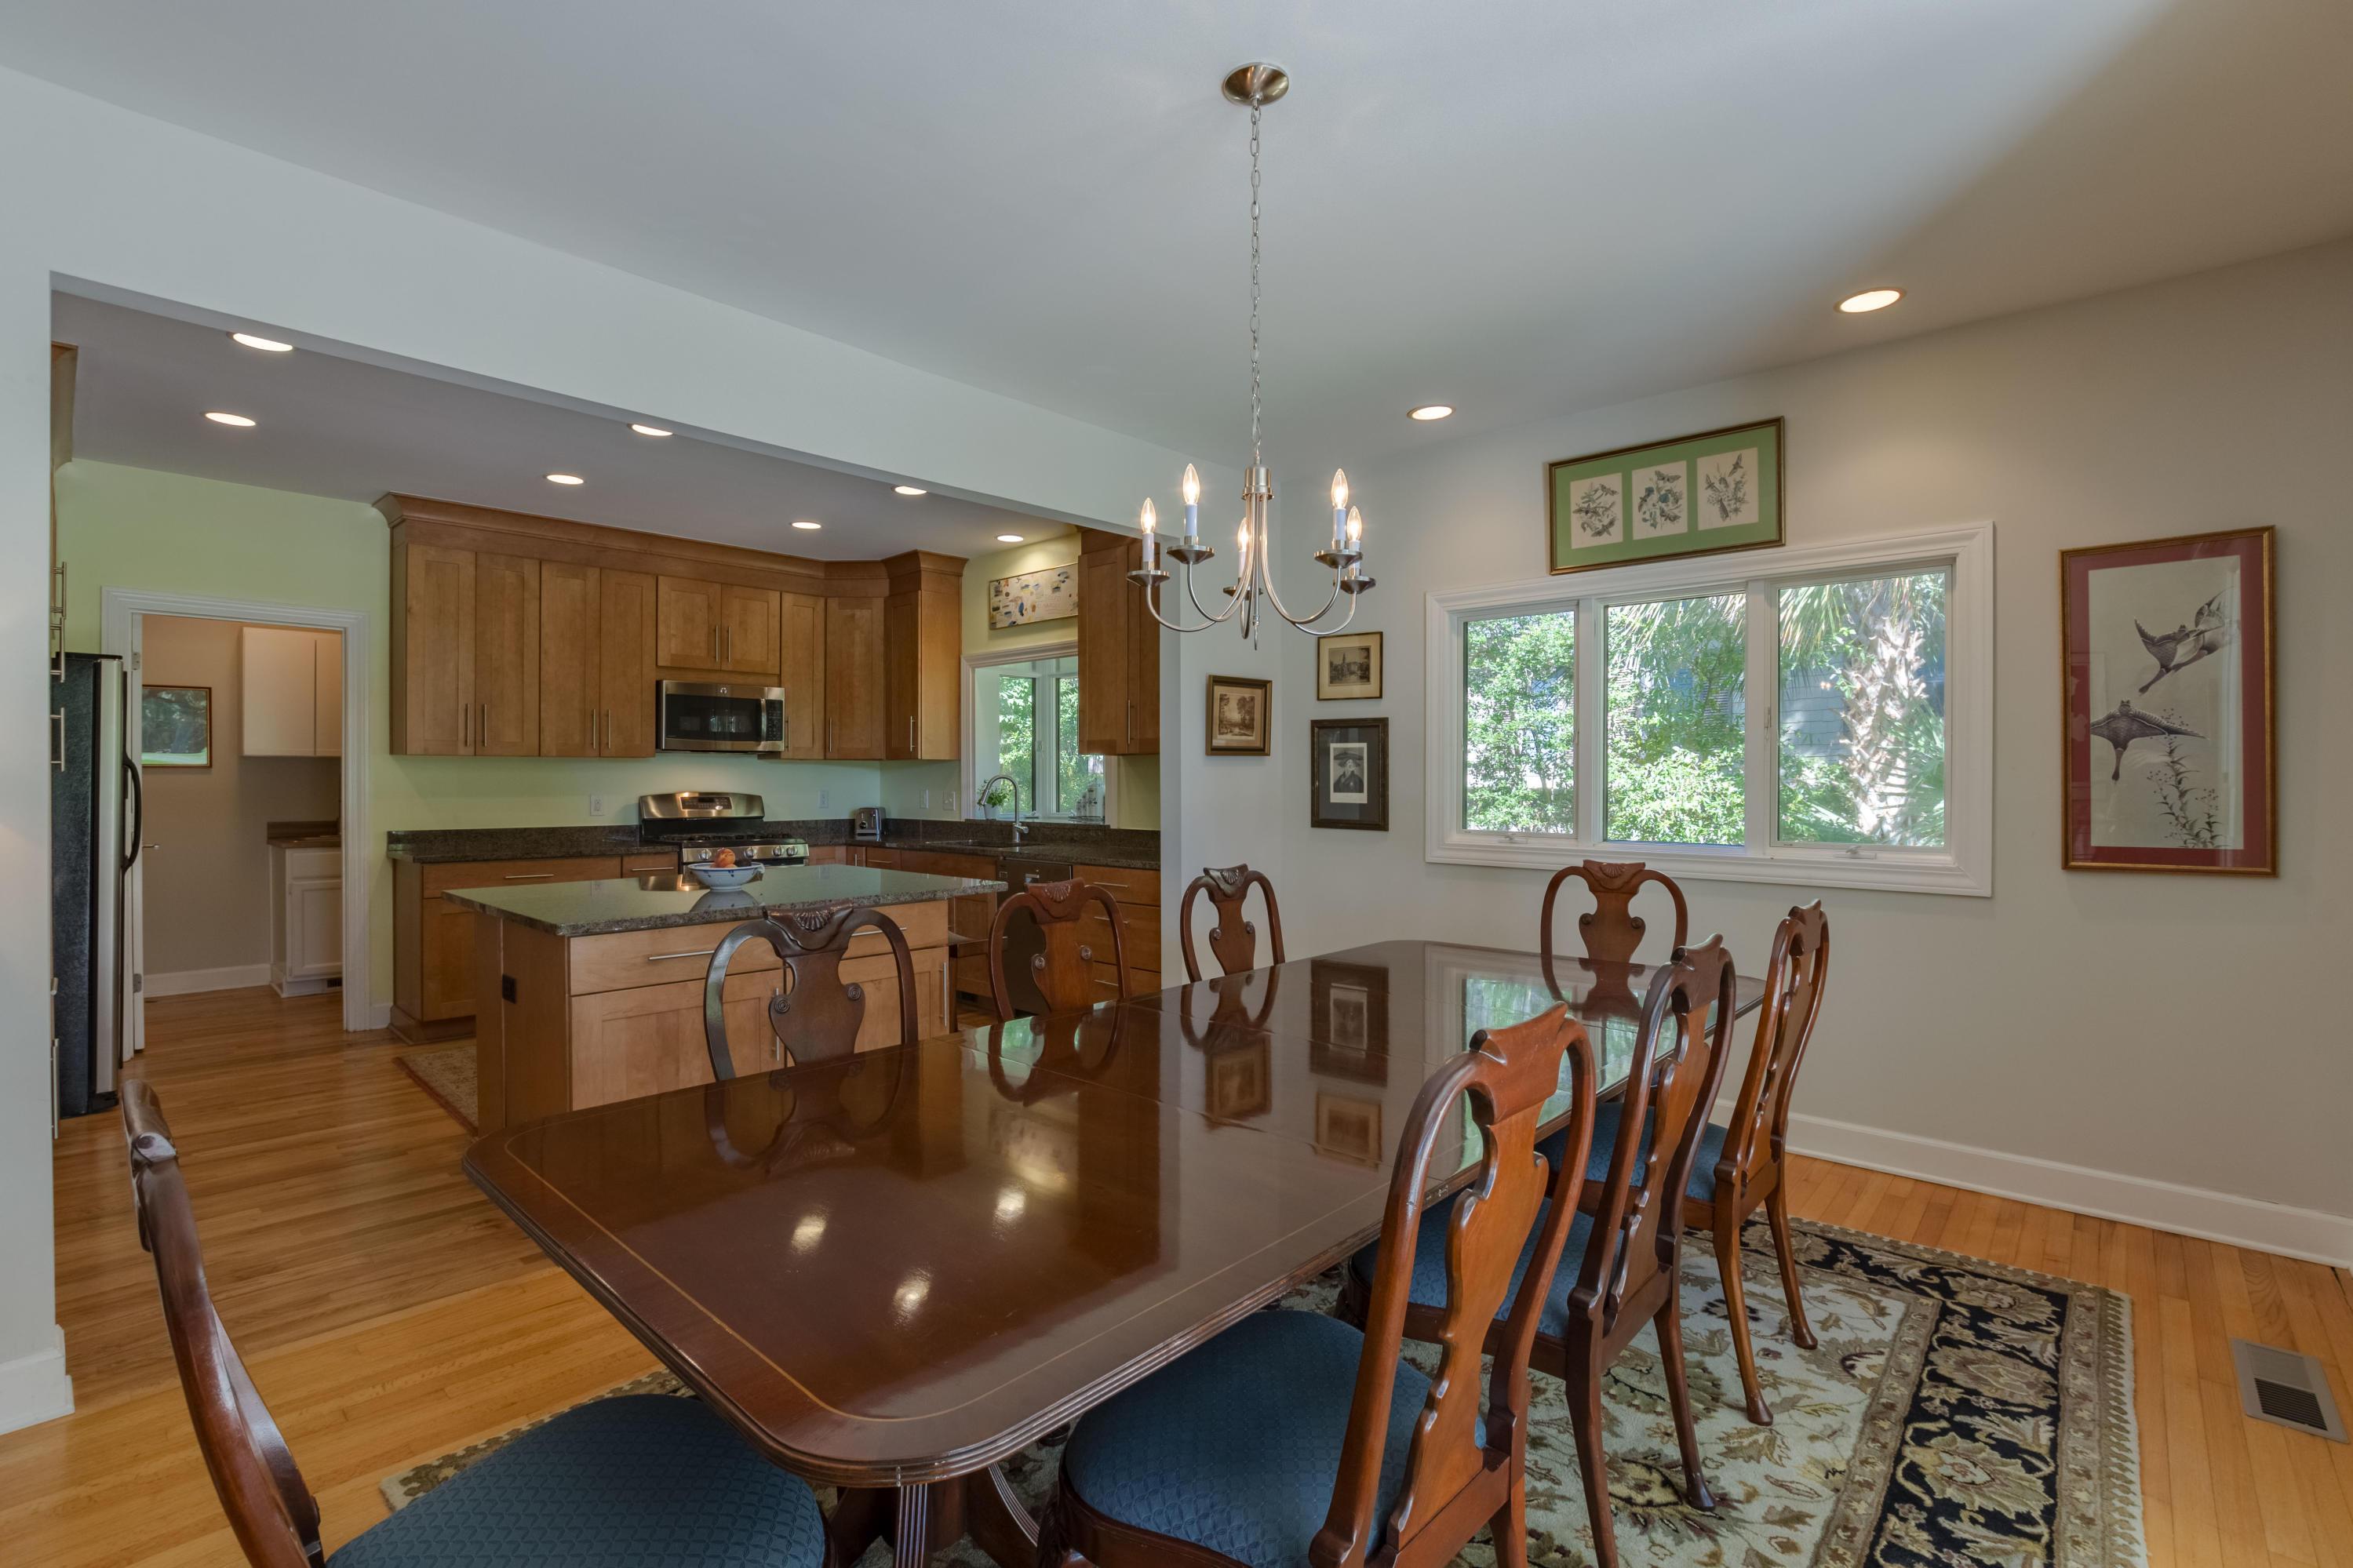 Middlewoods East Homes For Sale - 223 Sea Marsh, Kiawah Island, SC - 21